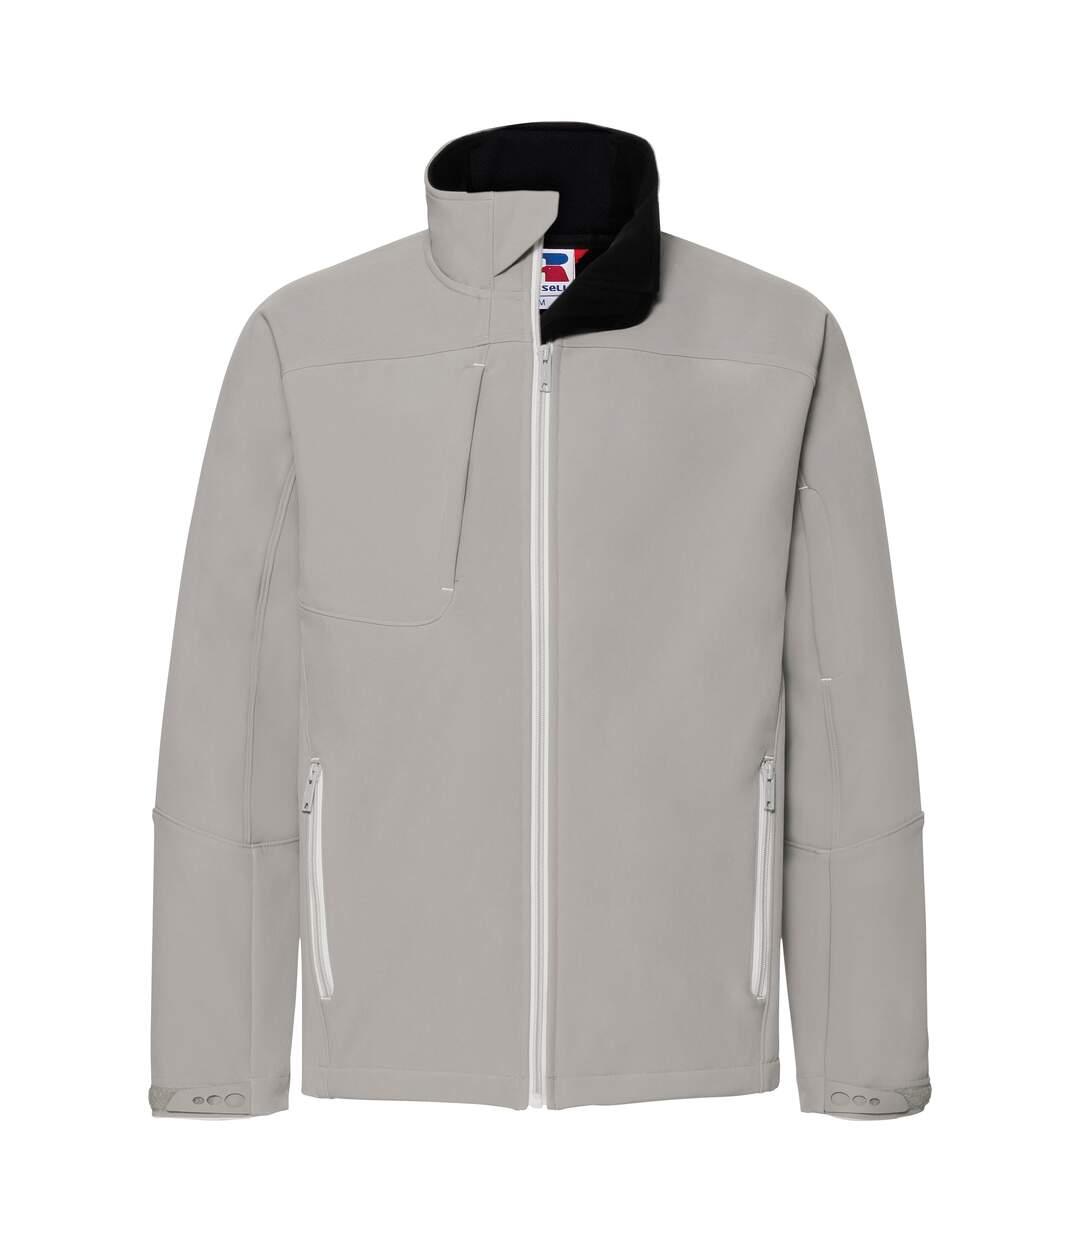 Russell Mens Bionic Softshell Jacket (Black) - UTRW6161